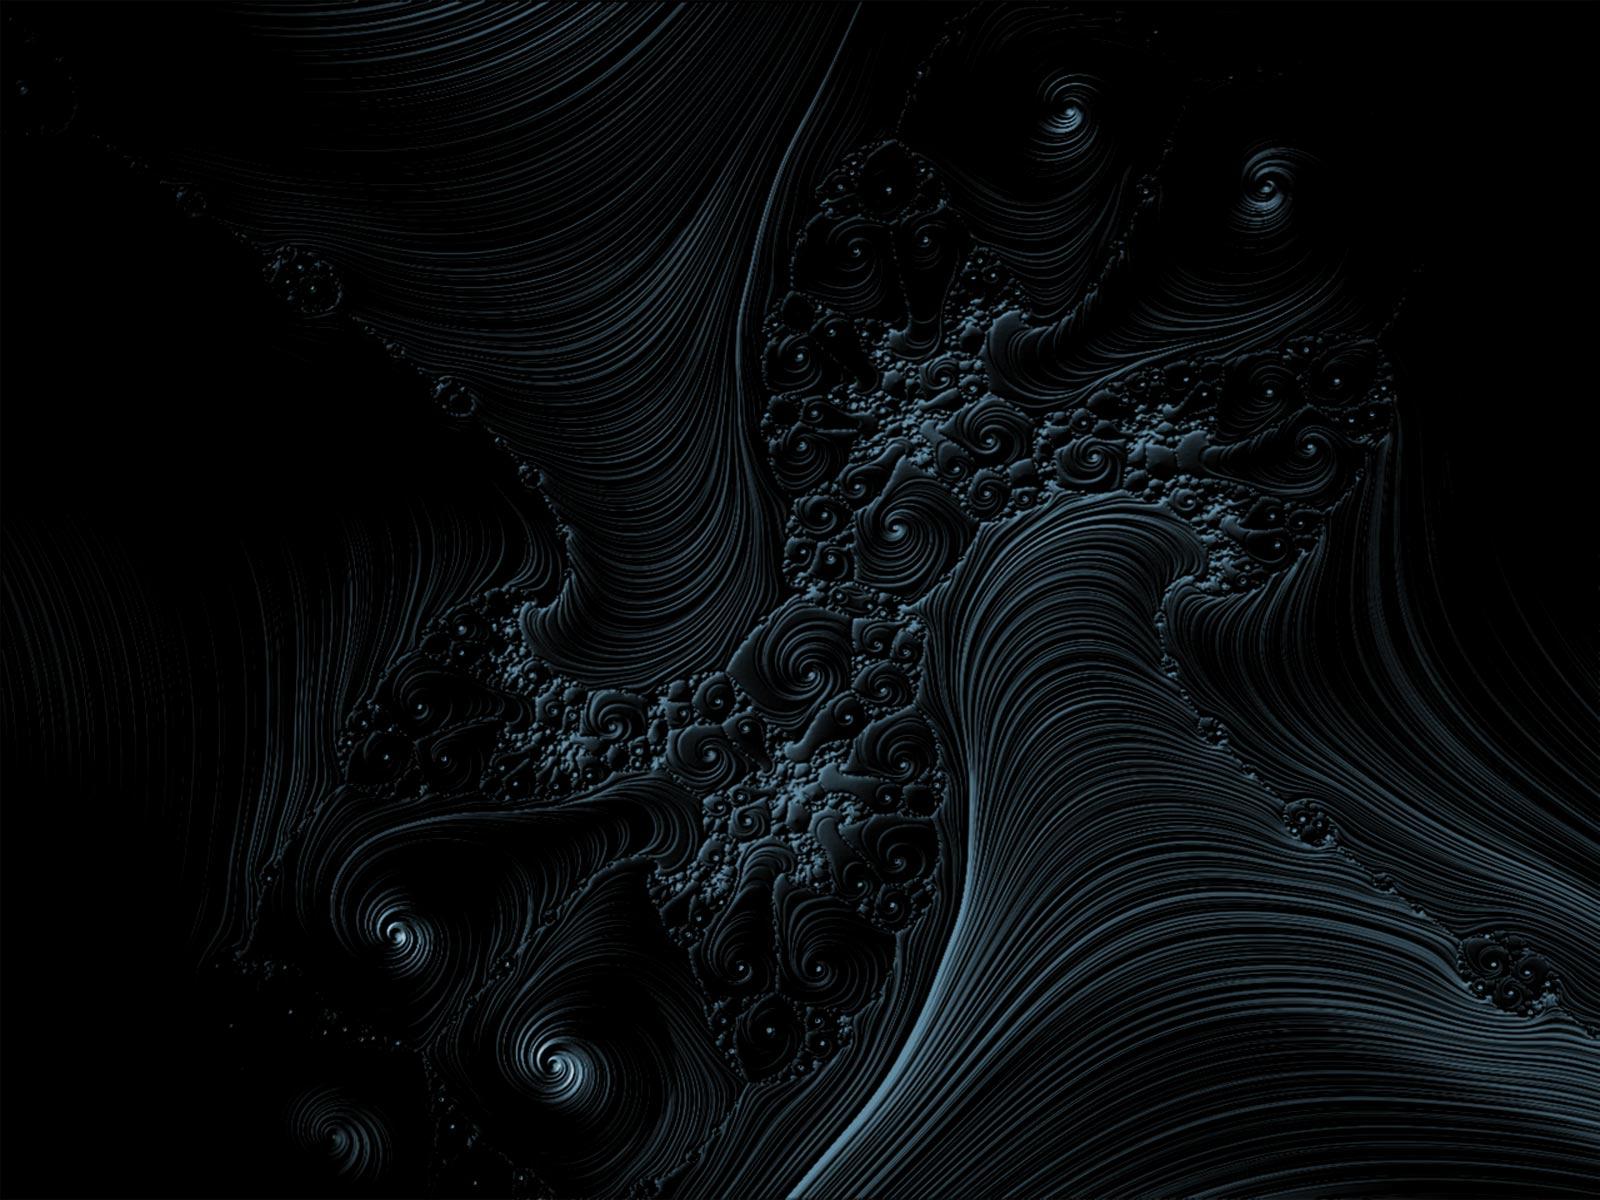 ca97fd8a344 Black Epreet Cool Black Wallpapers 1600x1200